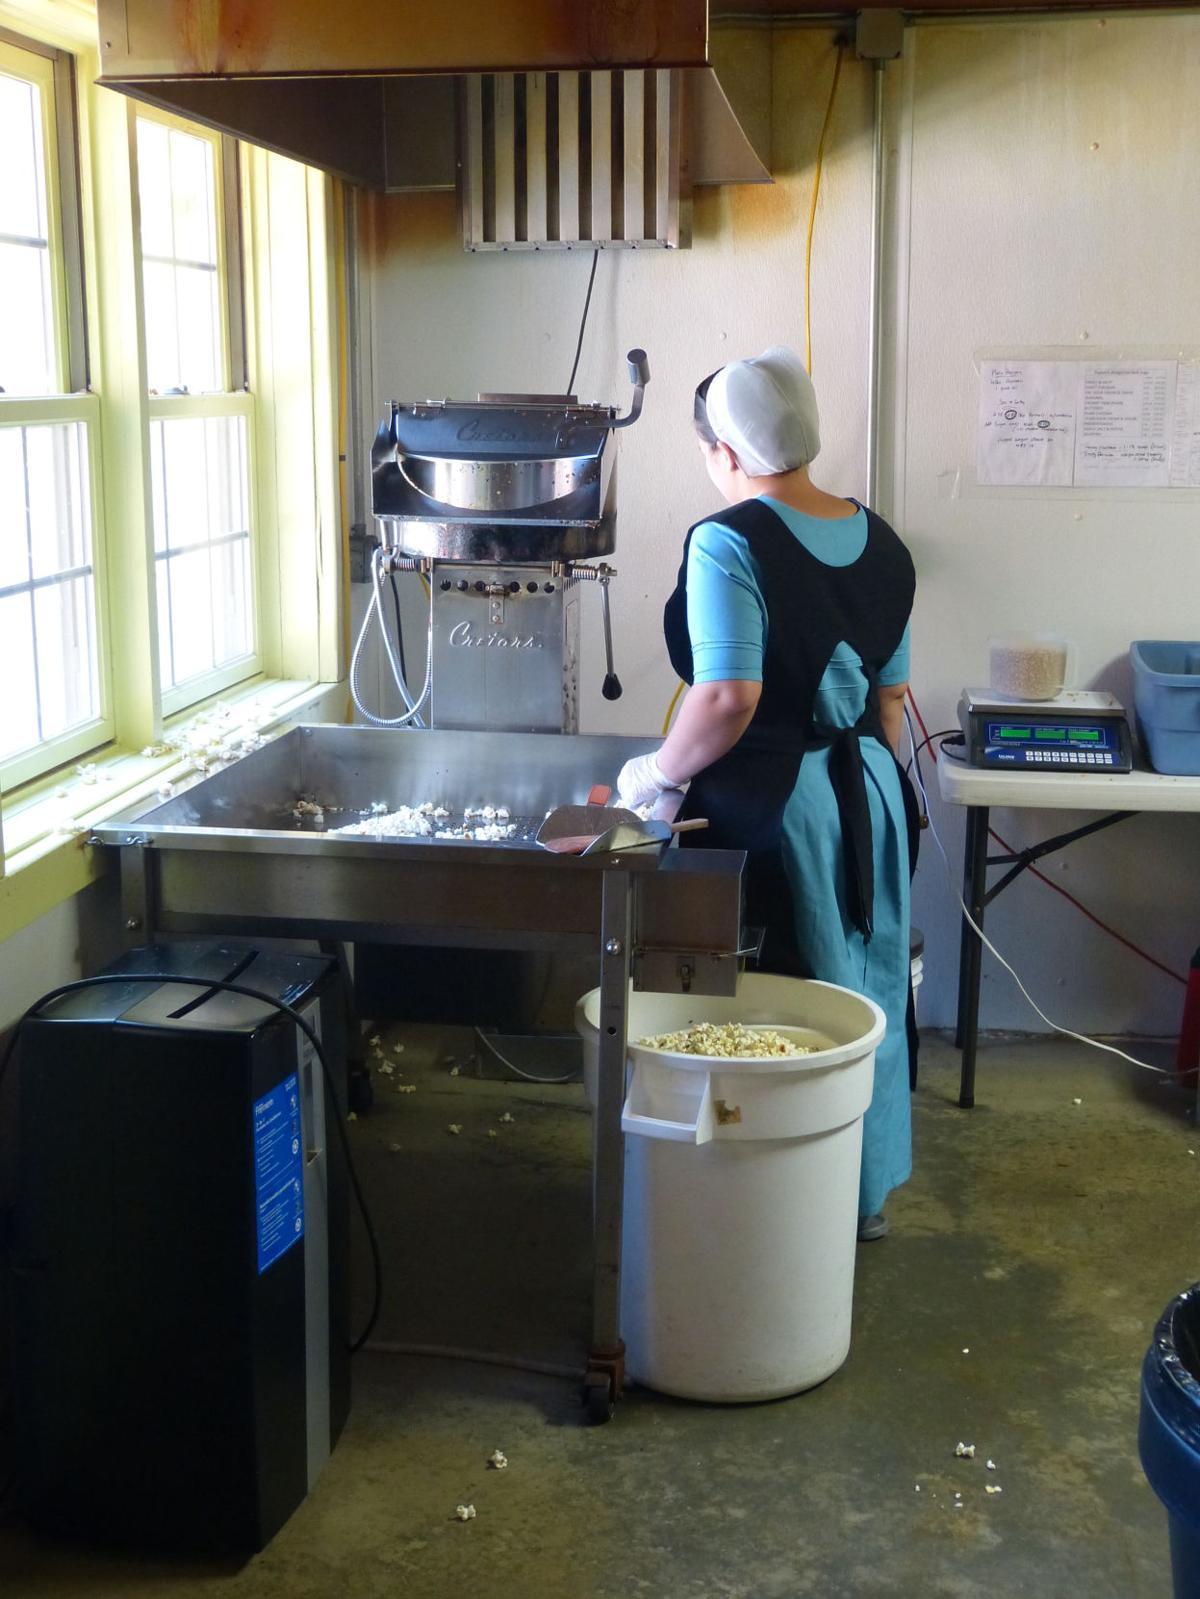 Amish conference - Emma's Gourmet Popcorn